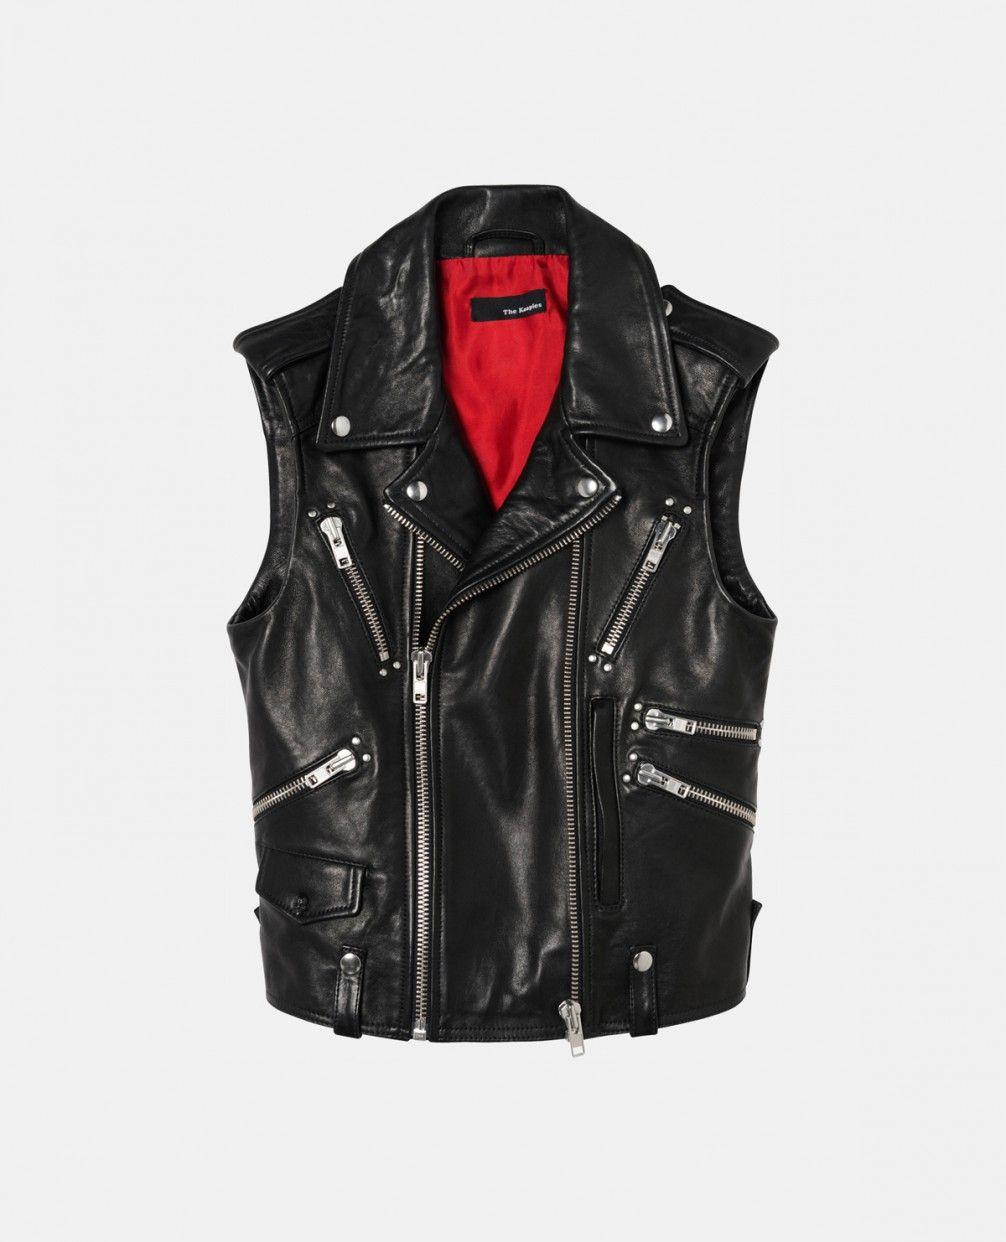 Biker jacket in lambskin leather without sleeves - Lookbook The Kooples -  LookBook - The Kooples